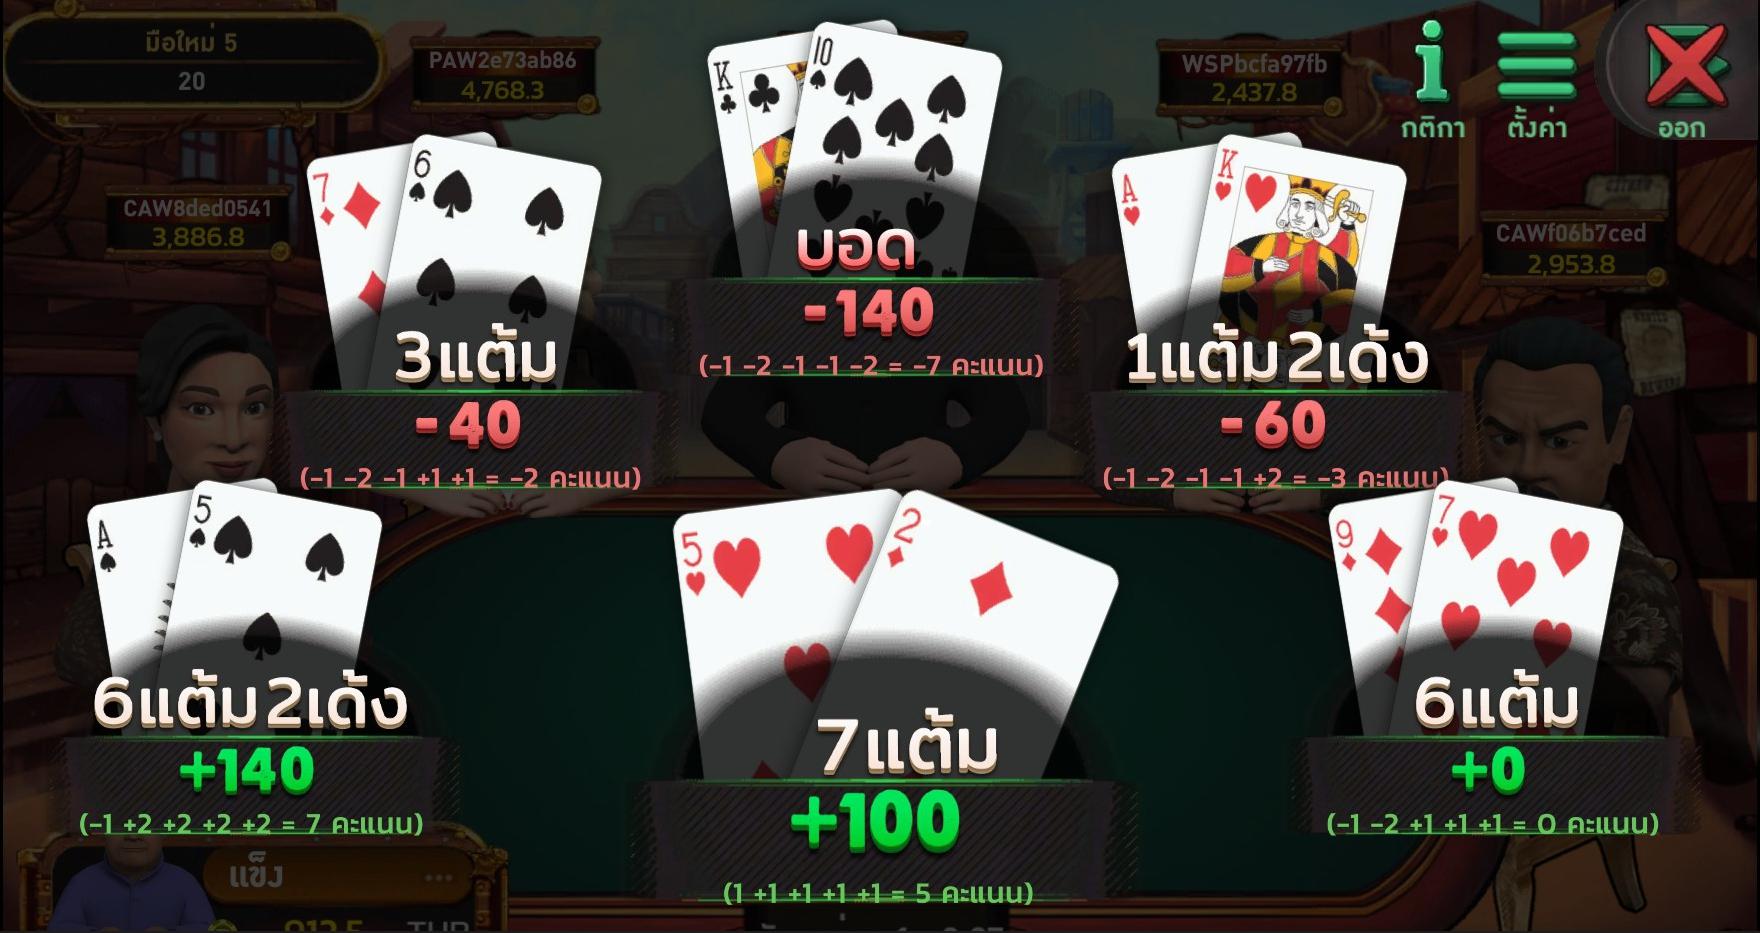 play game dragon battle royal 3 cards11